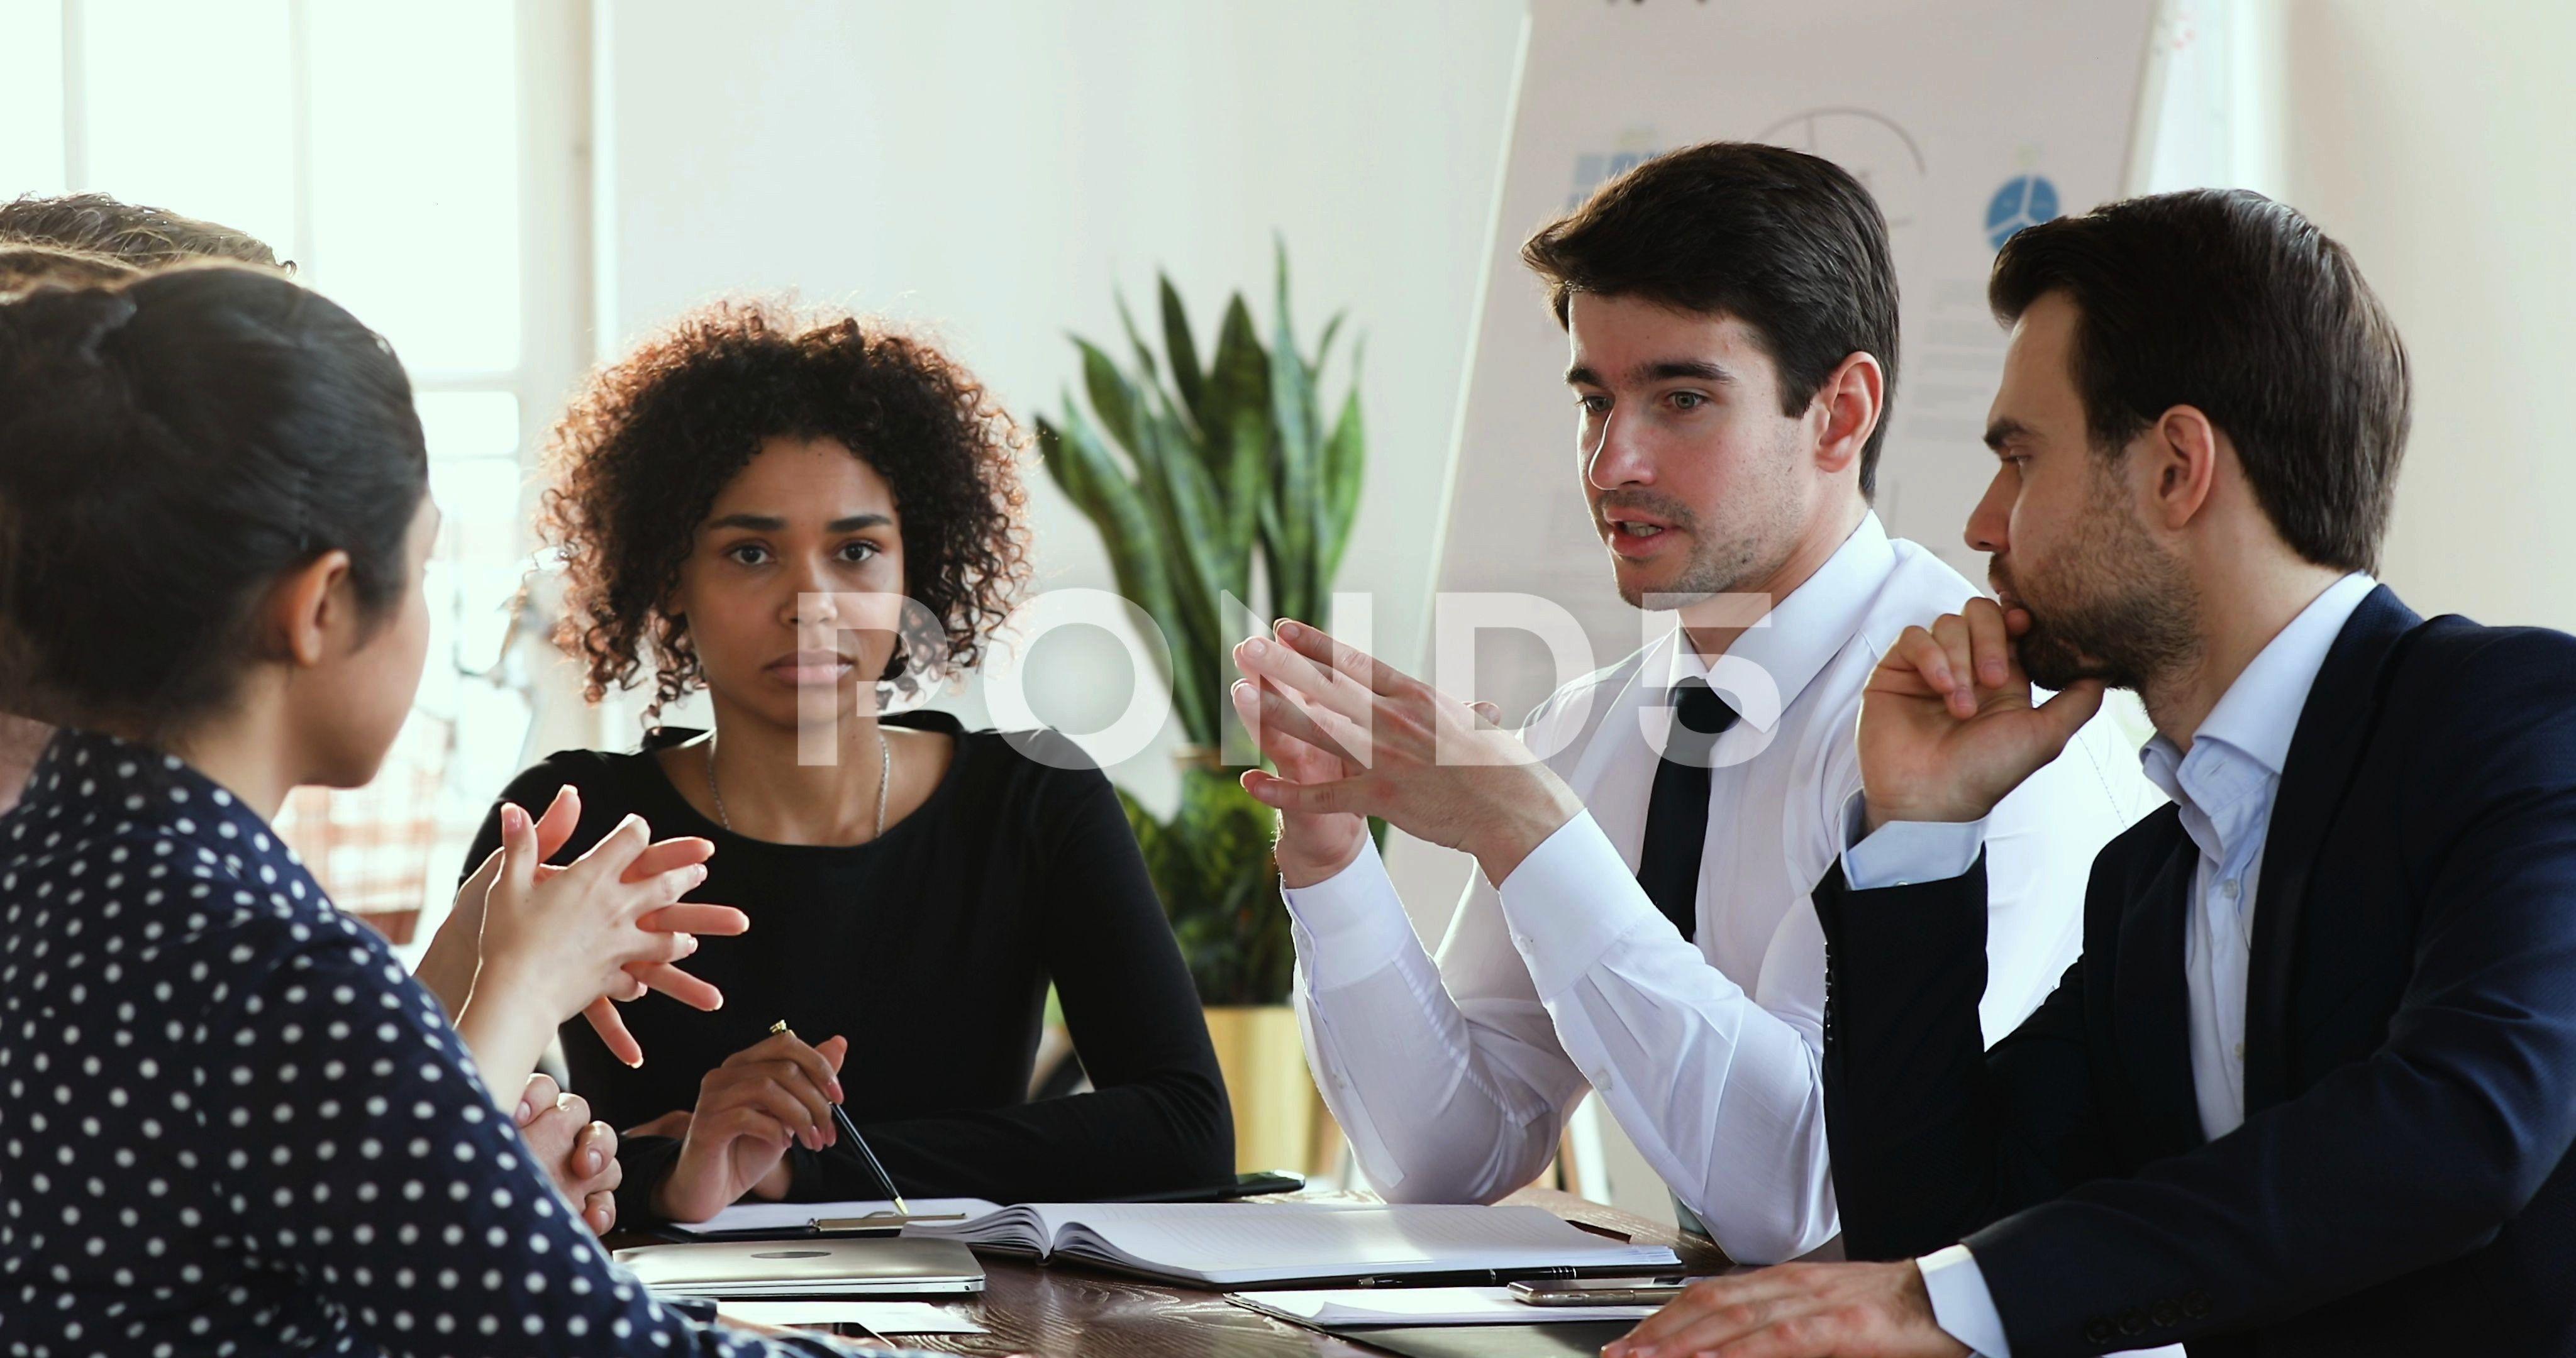 businessman leader explain corporate strategy speak at group meeting explaincorporateleaderConfidentConfident businessman leader explain corporate strategy speak at group...